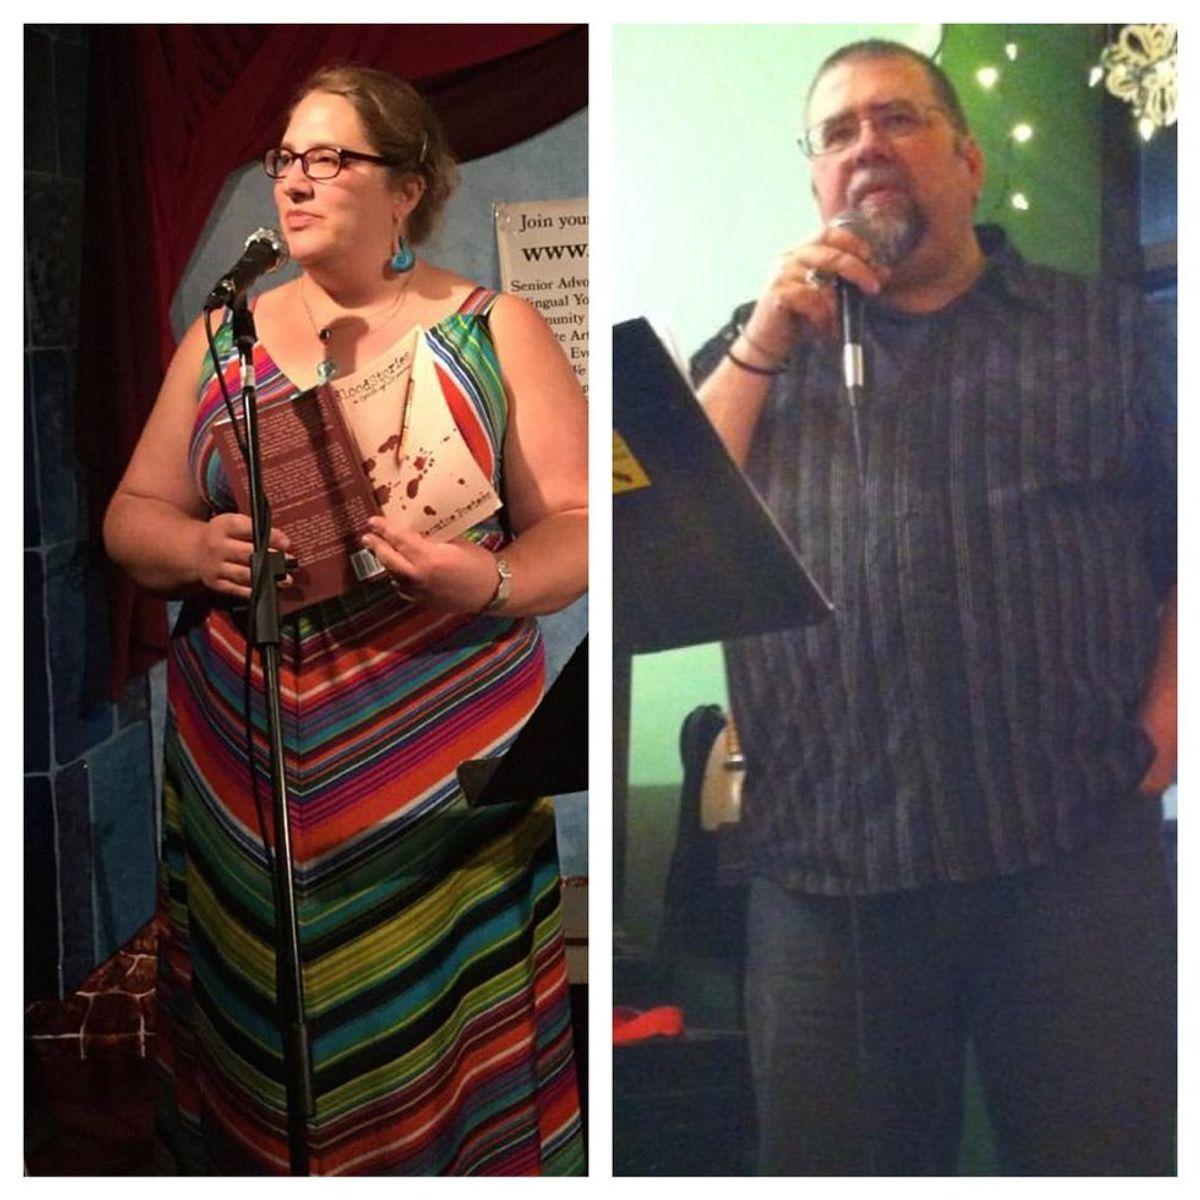 Poets of the Week: Jenuine Poetess and Tony Brown